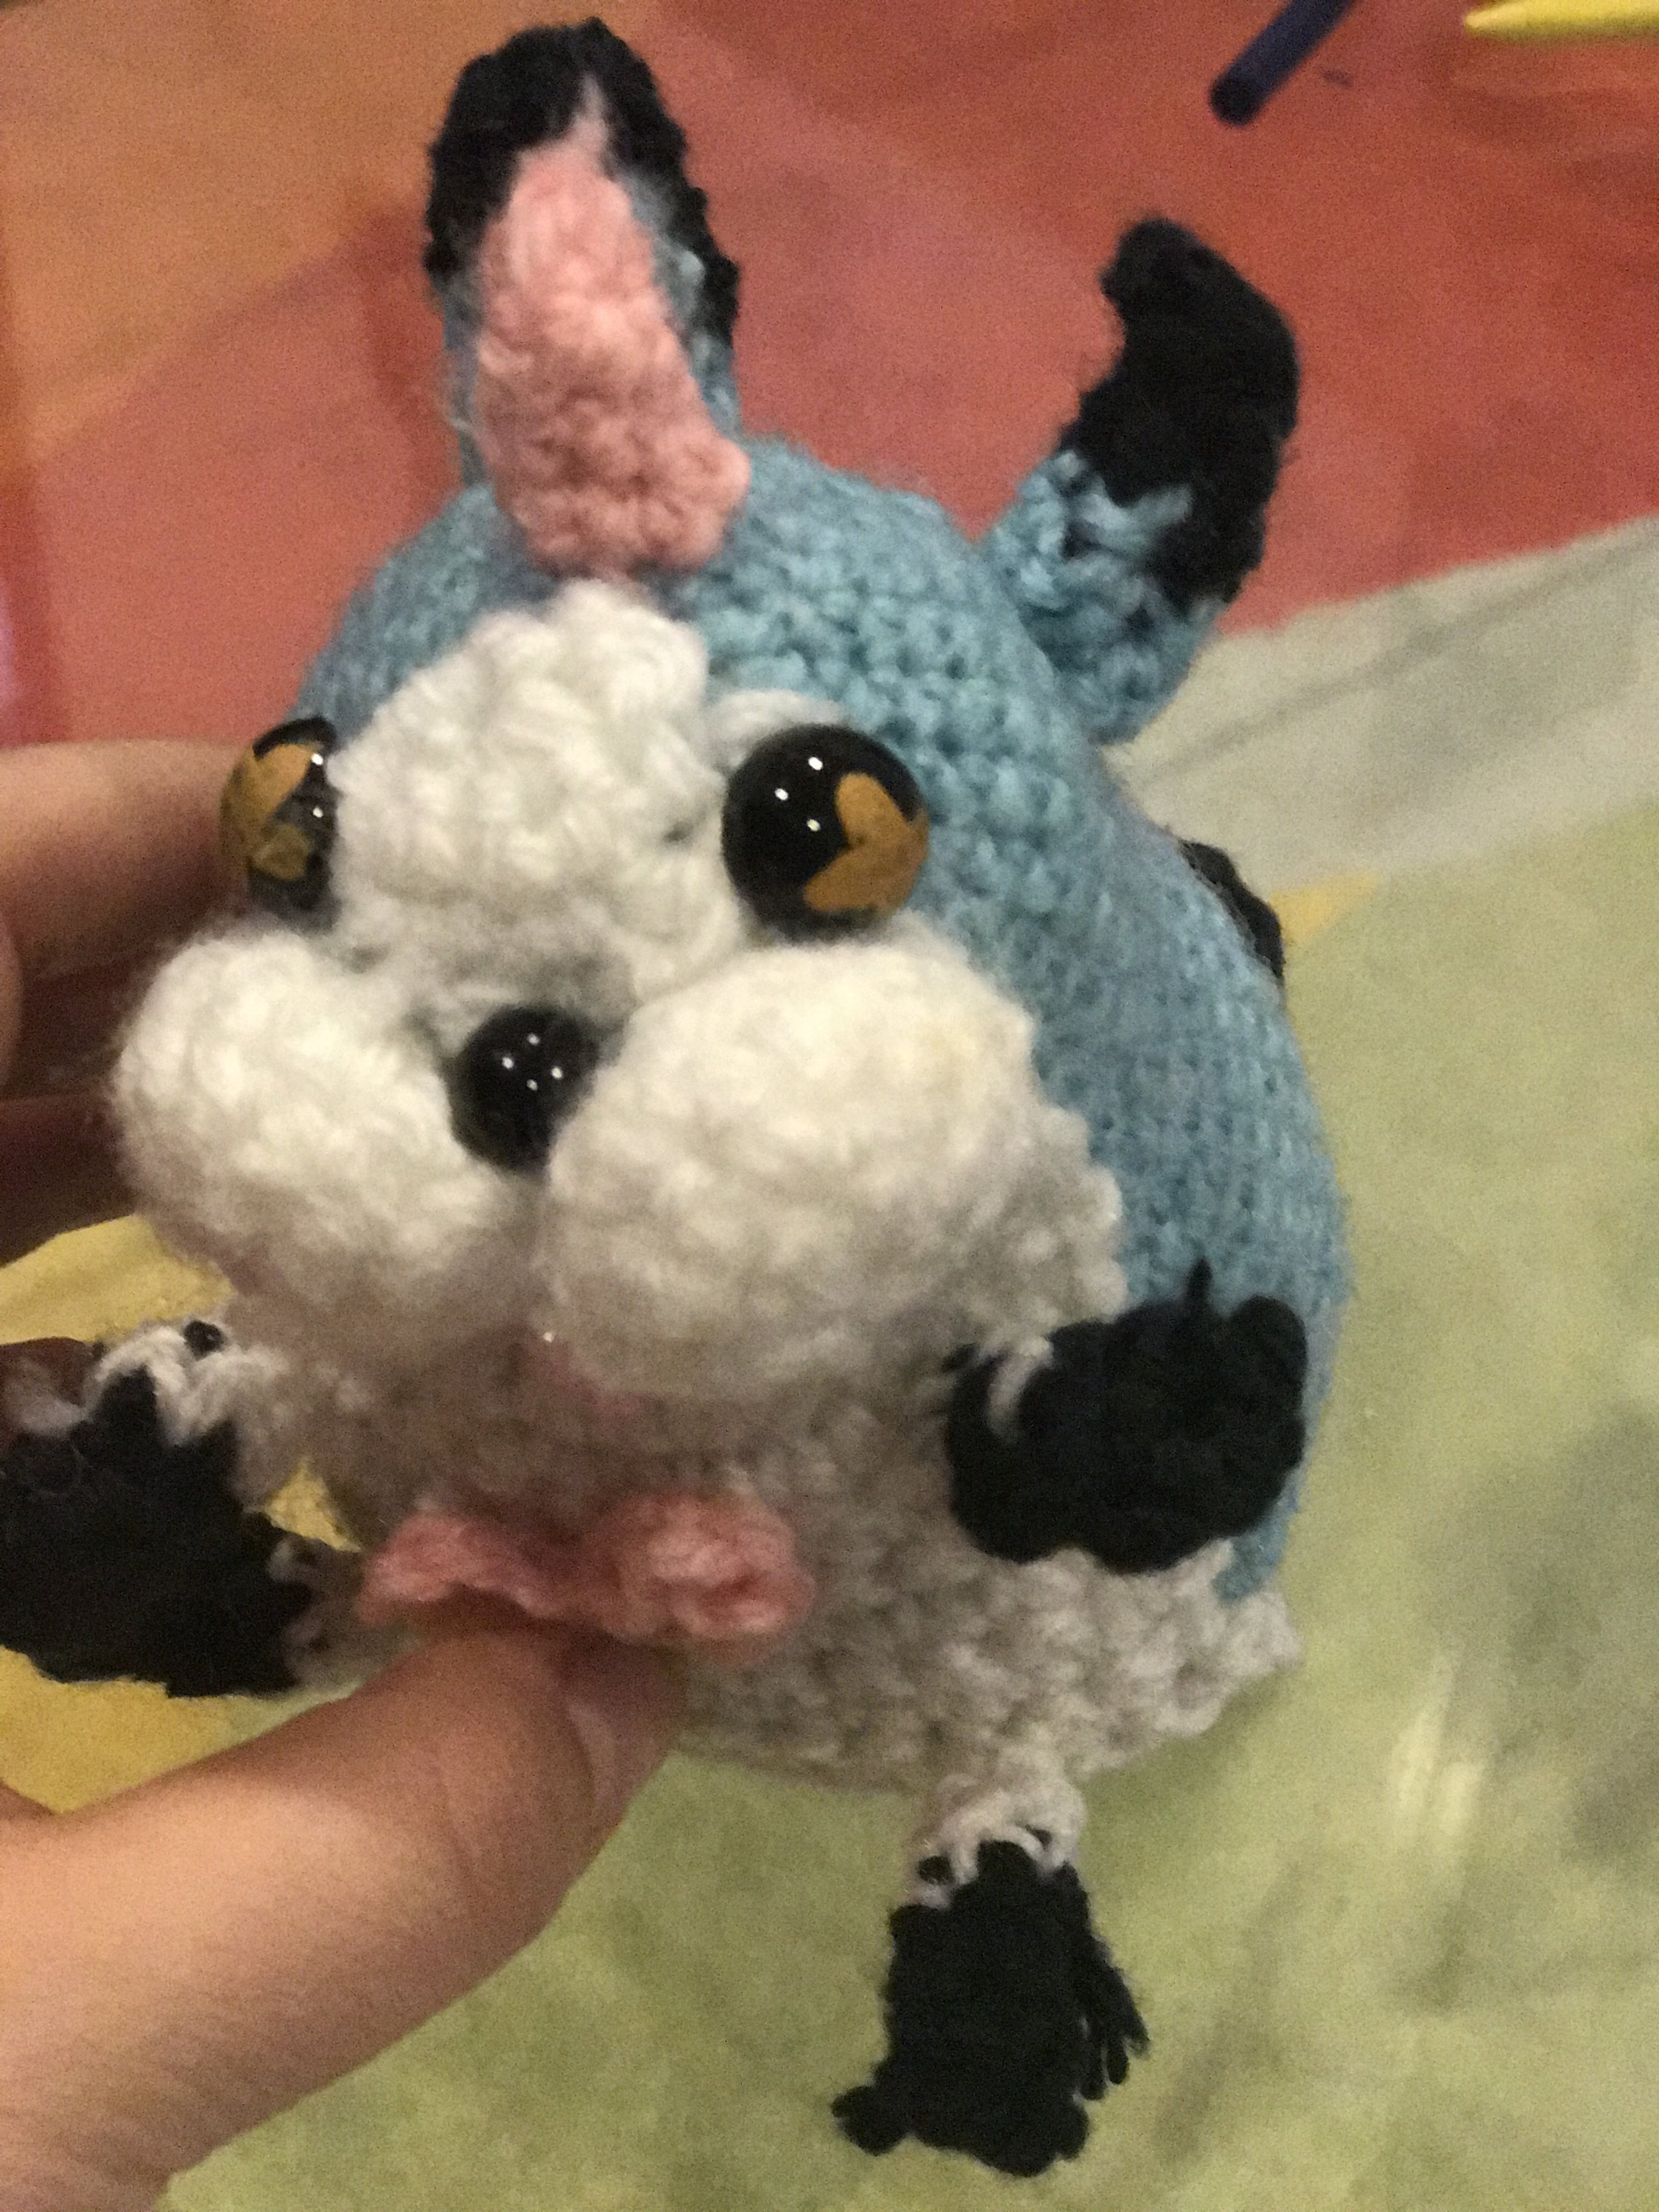 wonder nyan amigurumi crochet- made this from scratch